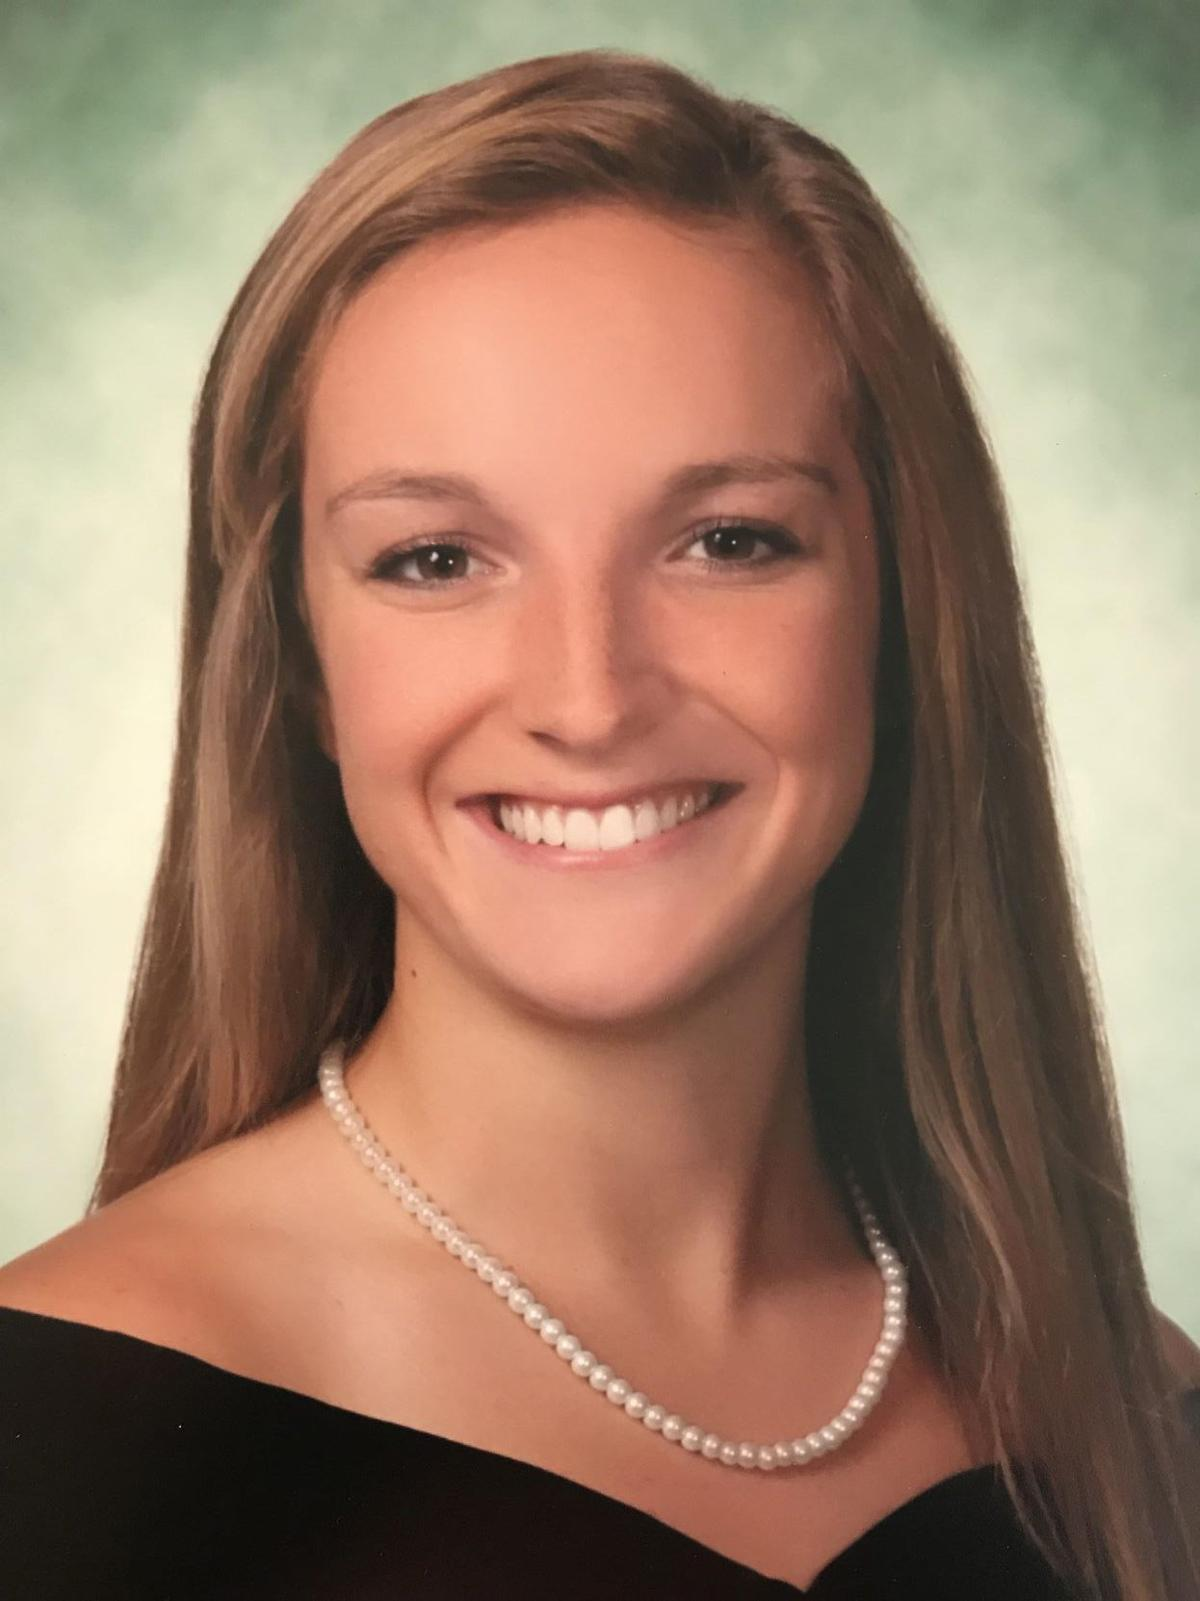 Obituary: Cassidee Evelyn Kippes